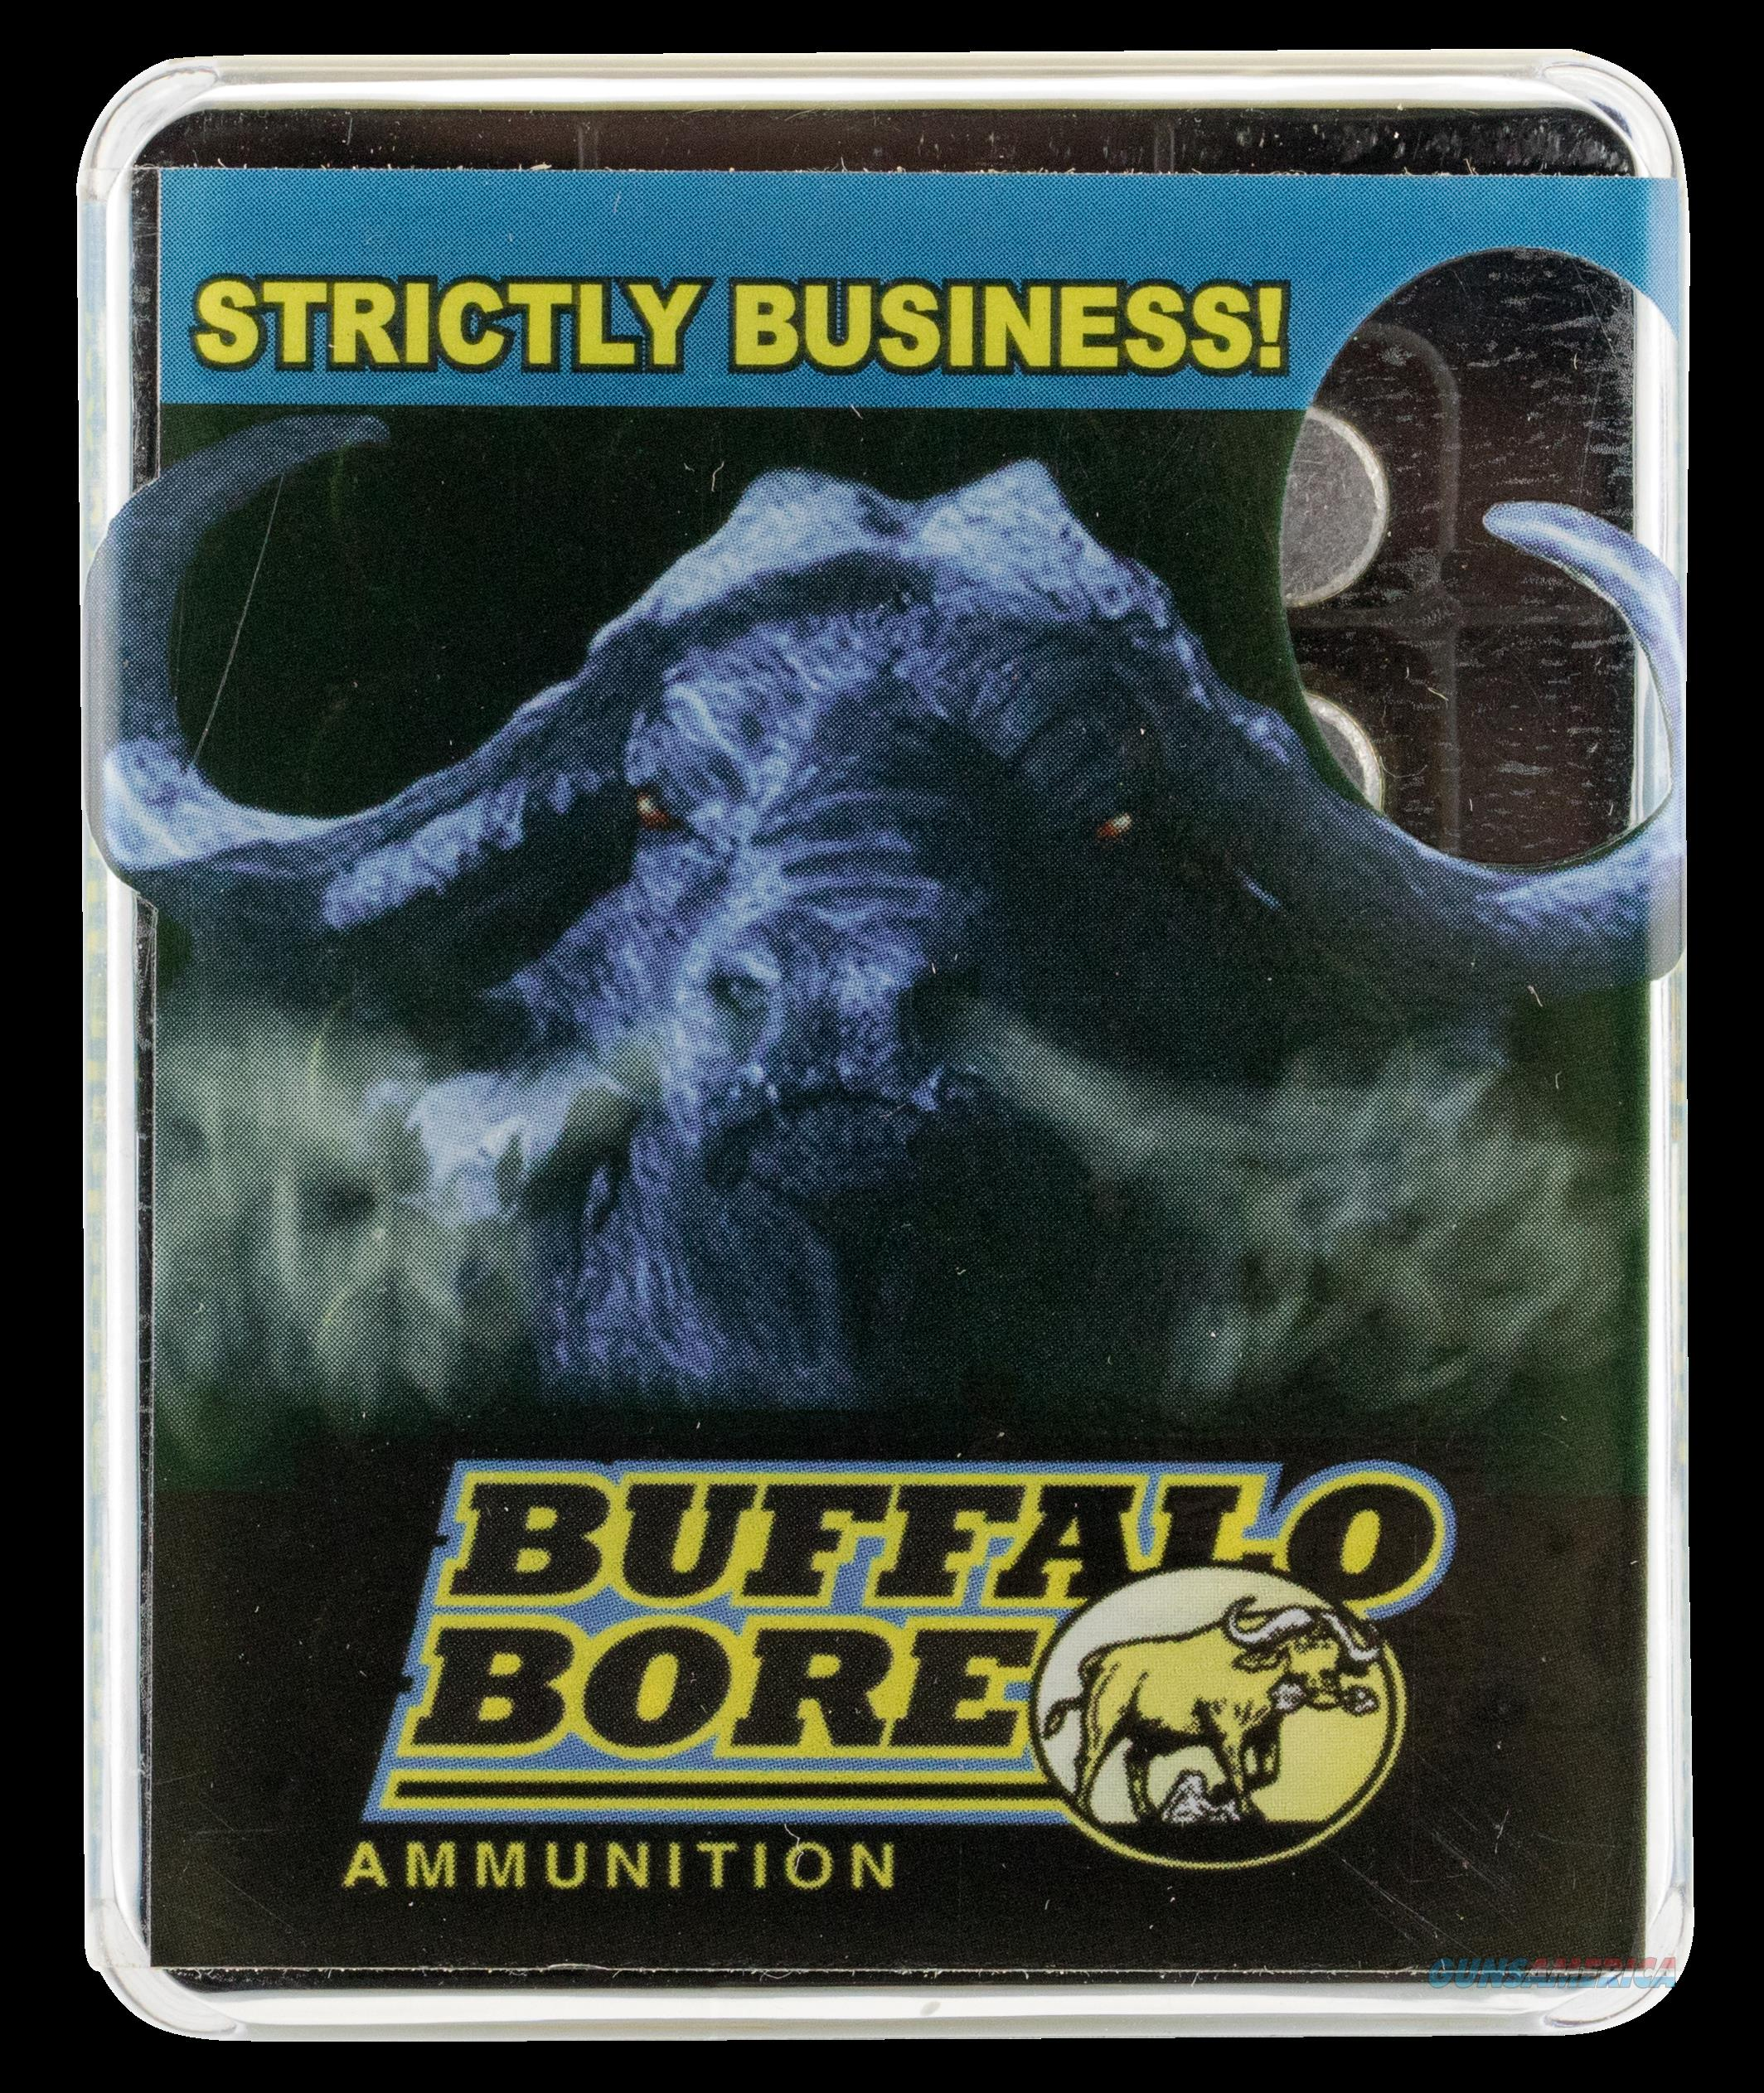 Buffalo Bore Ammunition Pistol, Bba 32b-20 45ar 200gr Jhp +p     20-12  Guns > Pistols > 1911 Pistol Copies (non-Colt)